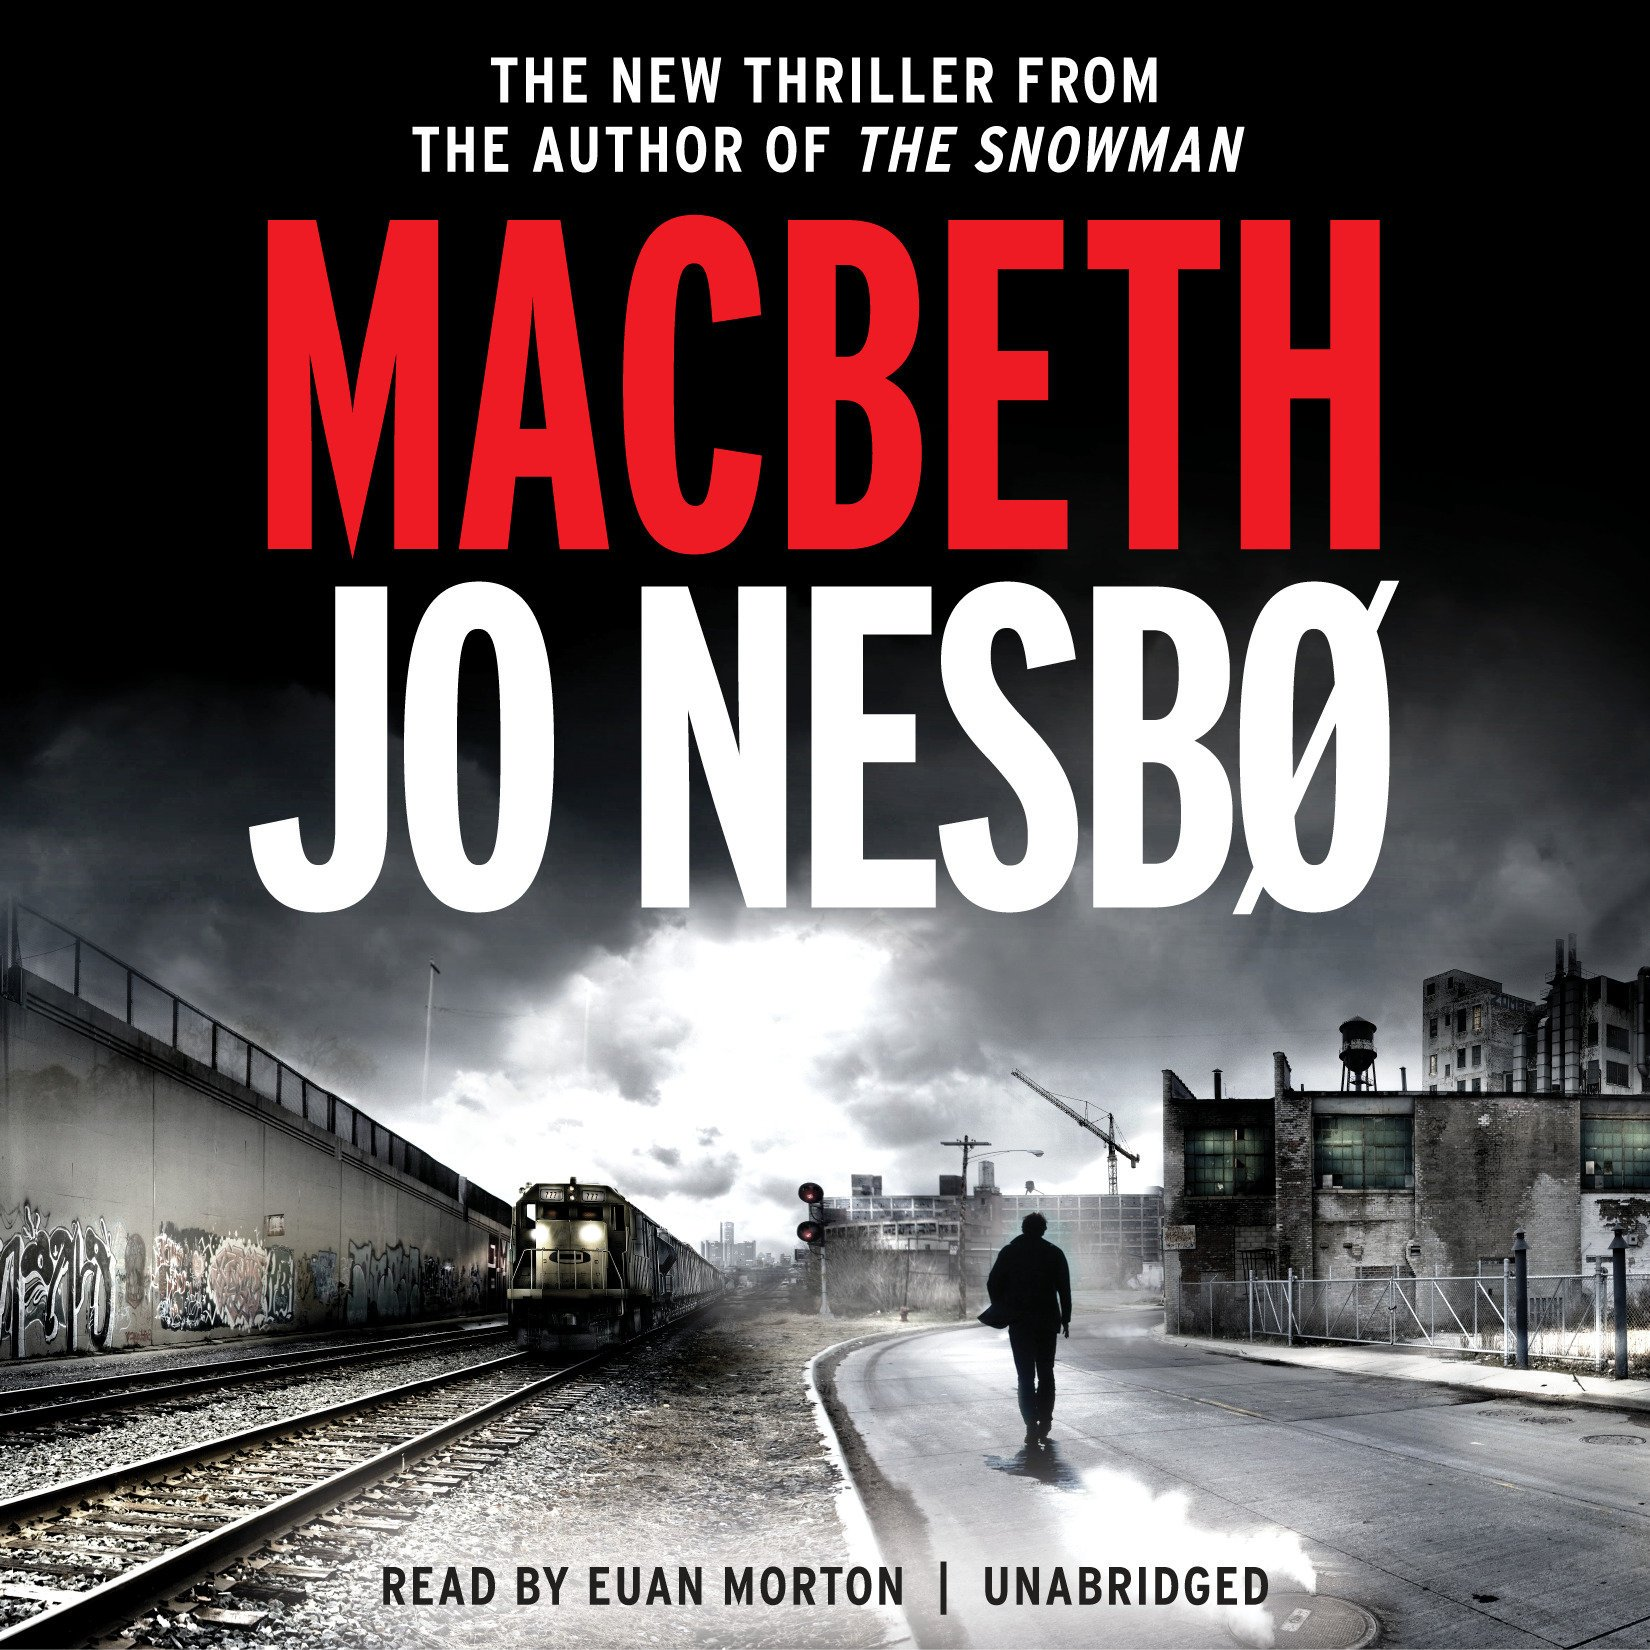 MACBETH 14D (Hogarth Shakespeare): Amazon.es: Nesbo, Jo, Morton, Euan: Libros en idiomas extranjeros